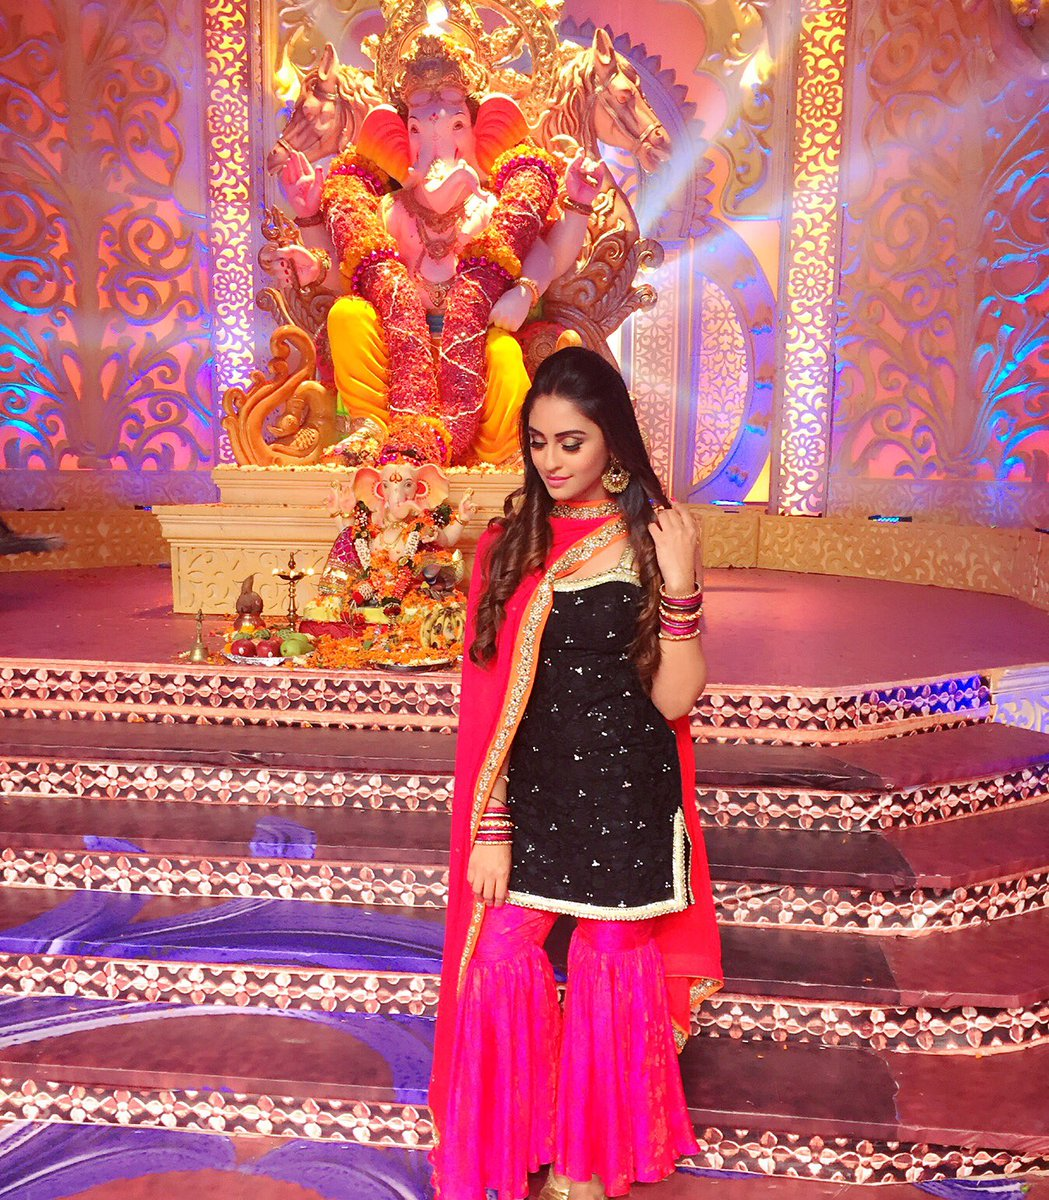 Krtysle Dsouza,Brahmarakshas,Zee TV,serail,Deva Shree Ganesha,Deva Shri Ganesha,pic,photo,image,picture